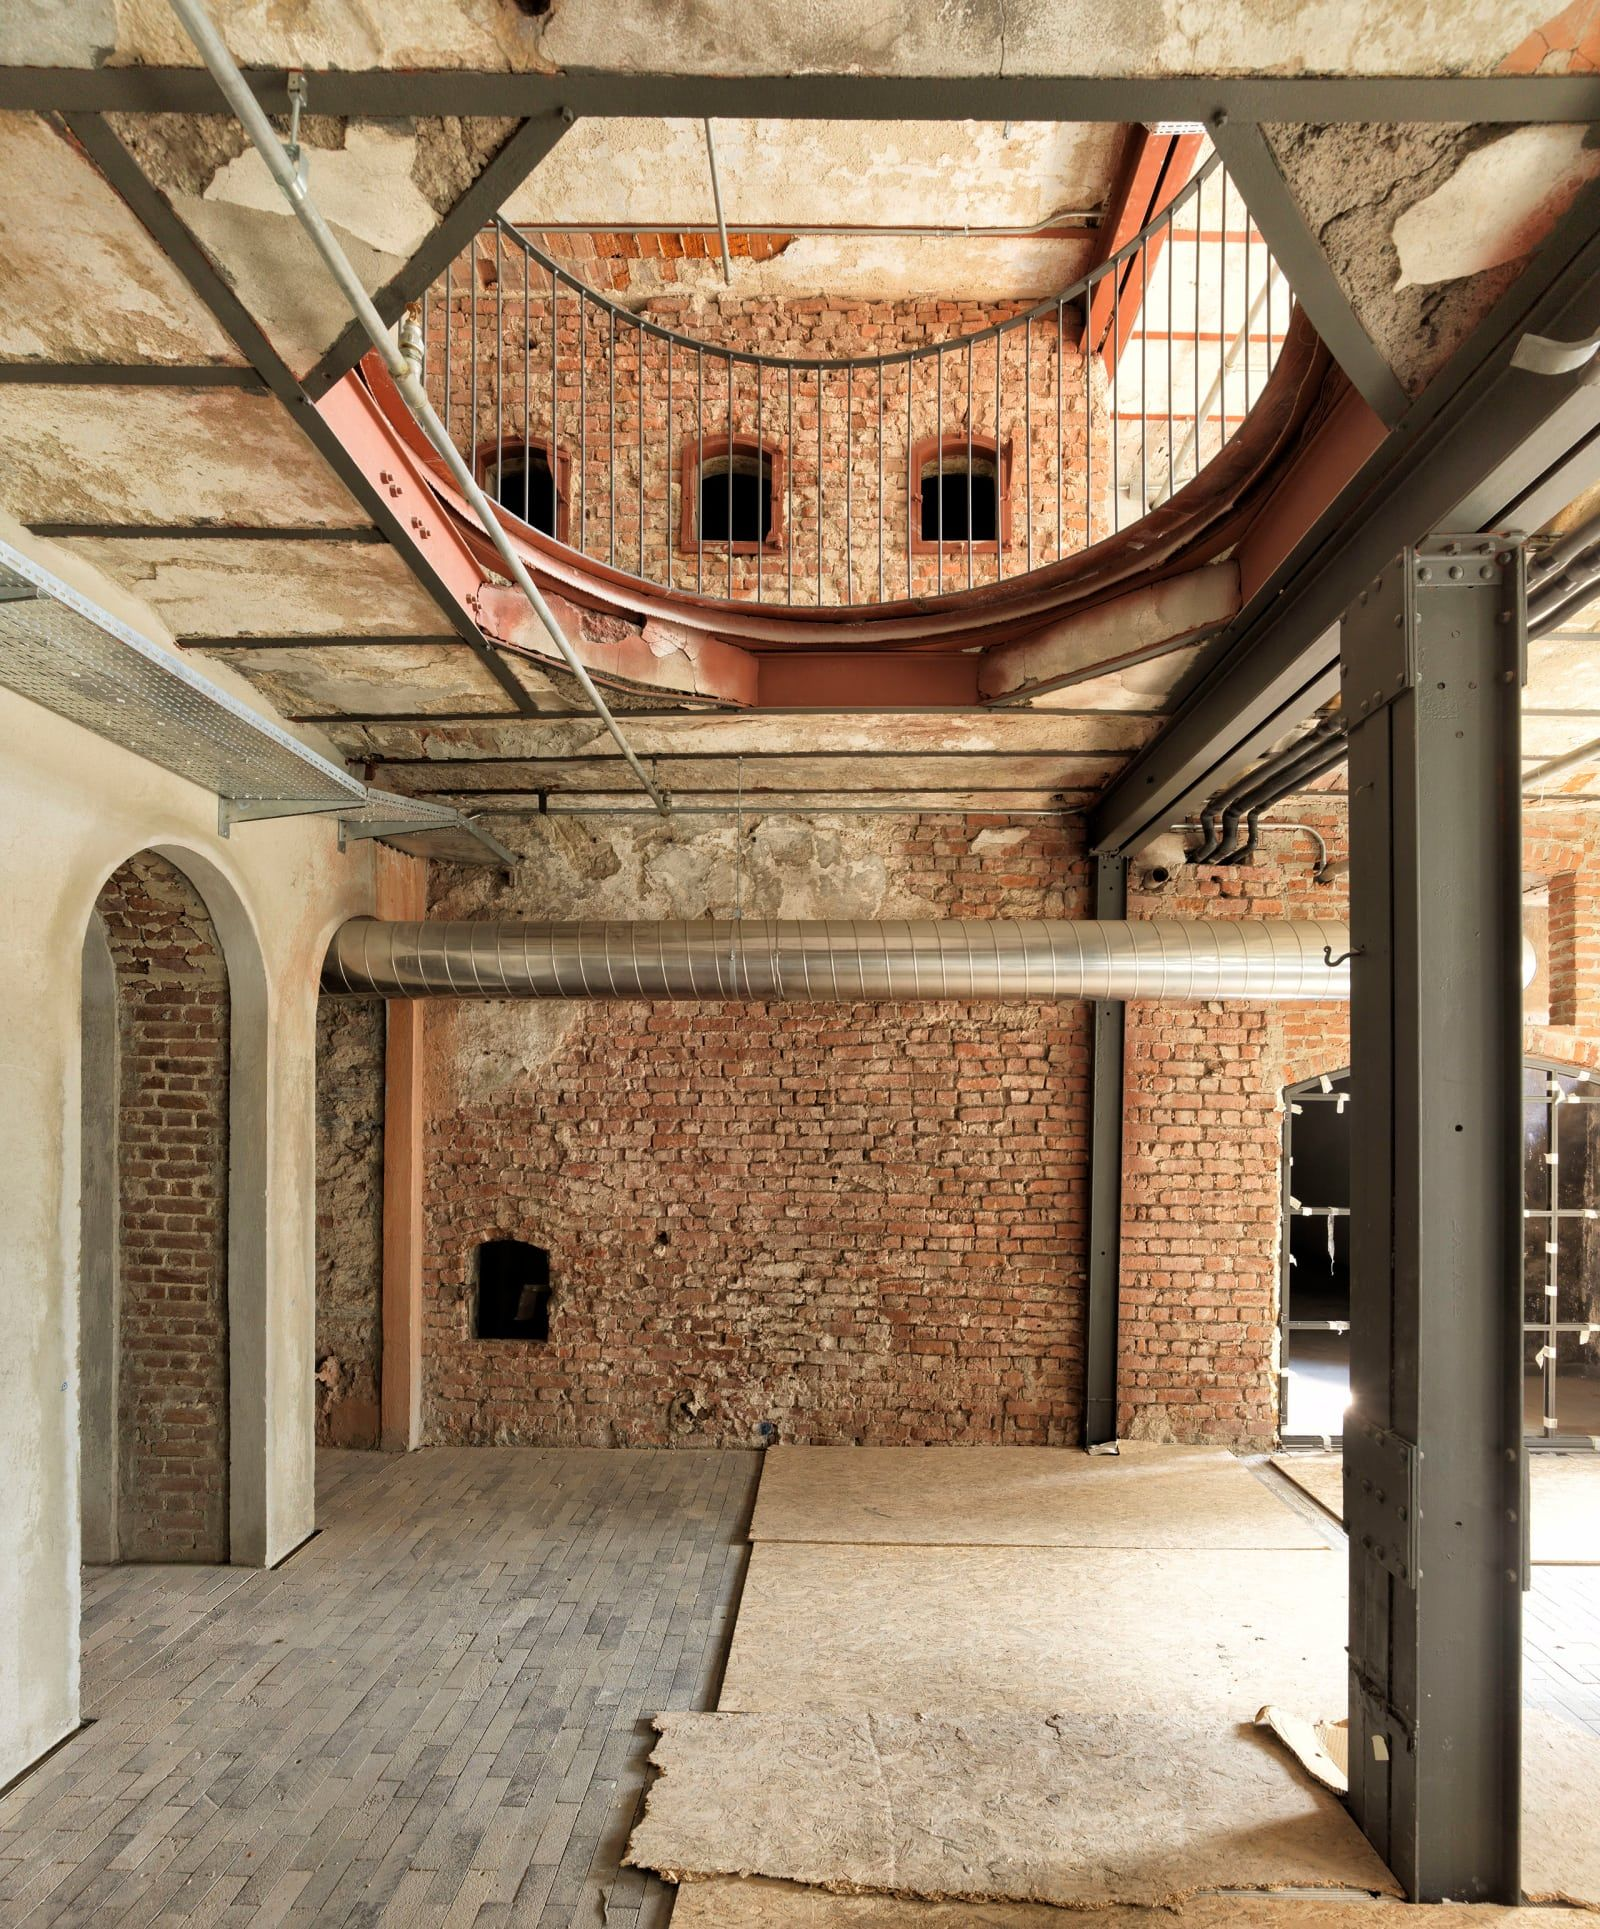 Han Tümertekin, Cemal Emden · Bomonti Brewery Interior